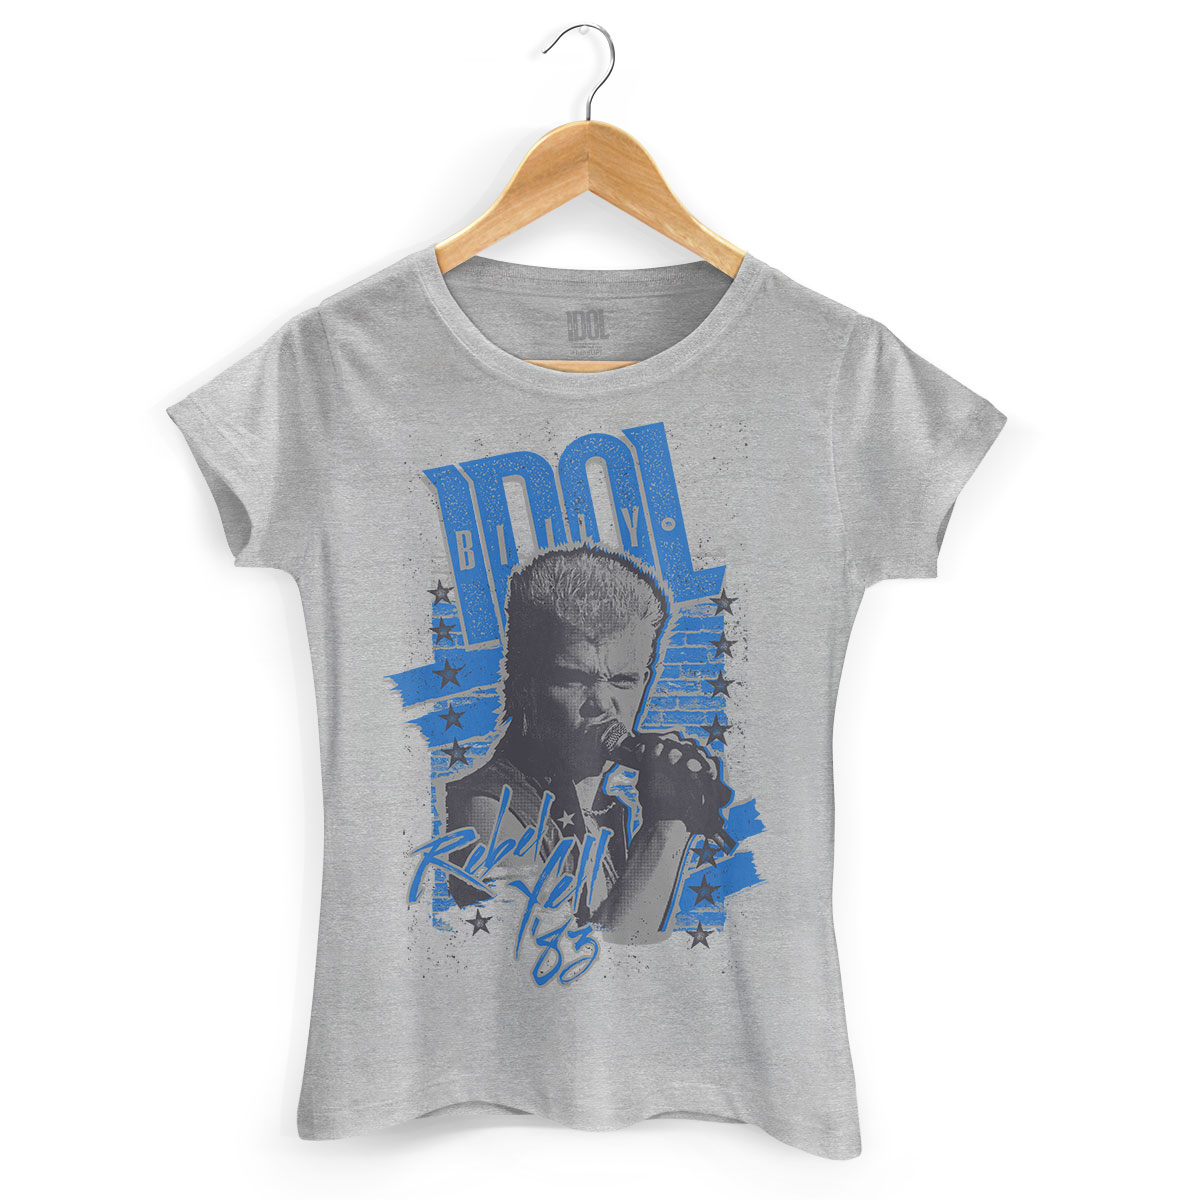 Camiseta Feminina Billy Idol Rebel Yell Face